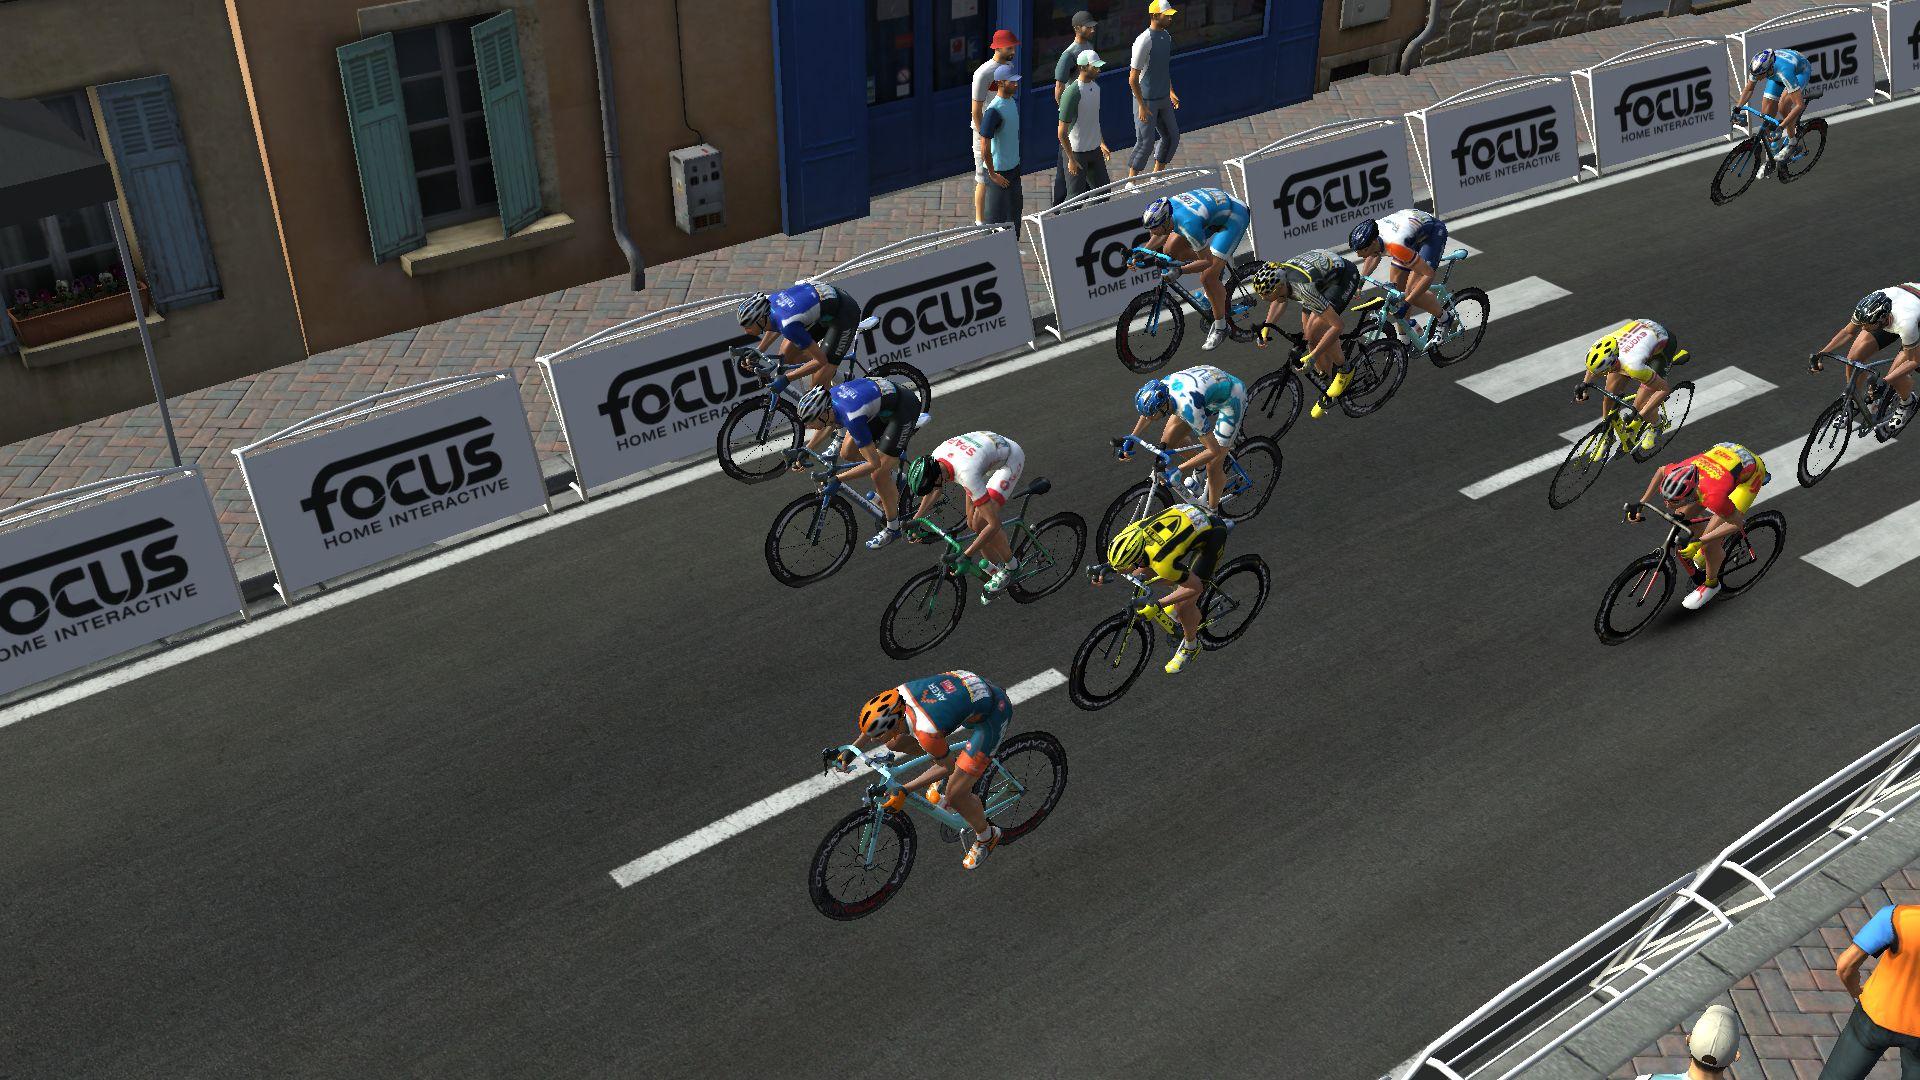 pcmdaily.com/images/mg/2019/Races/GTM/Giro/mg19_giro_10_PCM0139.jpg